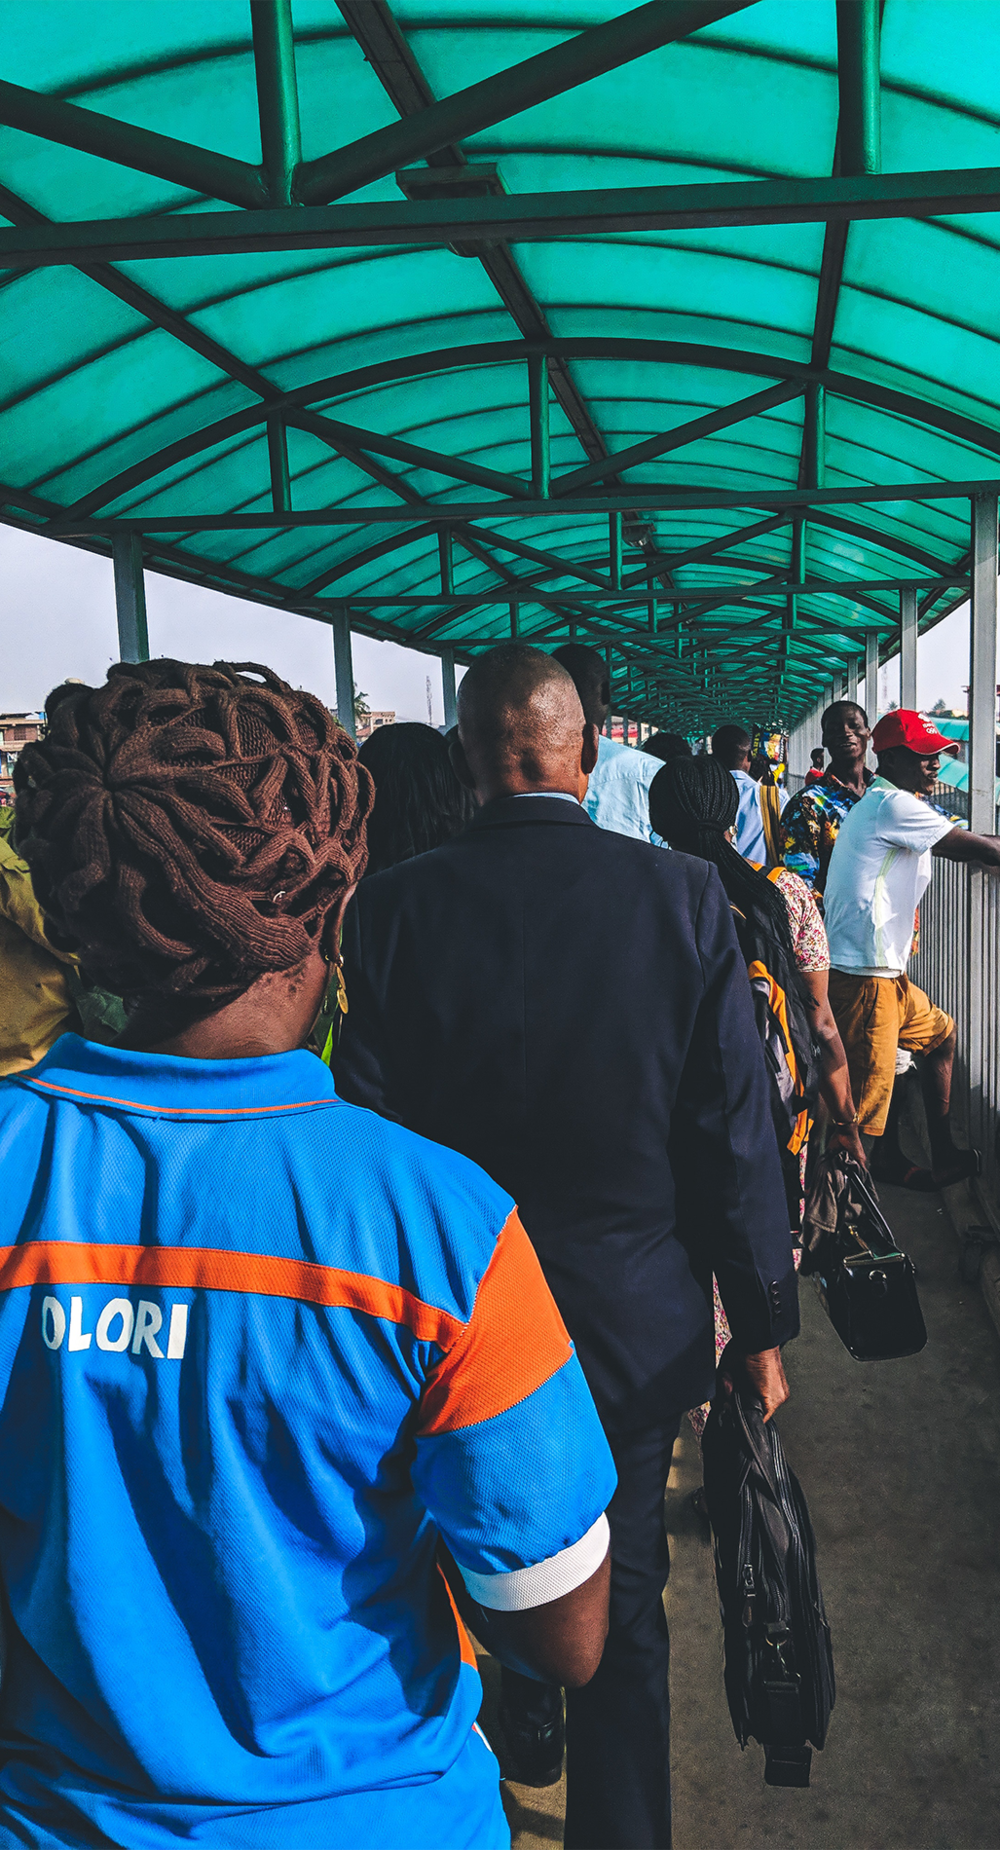 Nigerian citizens. Source: Joshua Oluwagbemiga via Unsplash